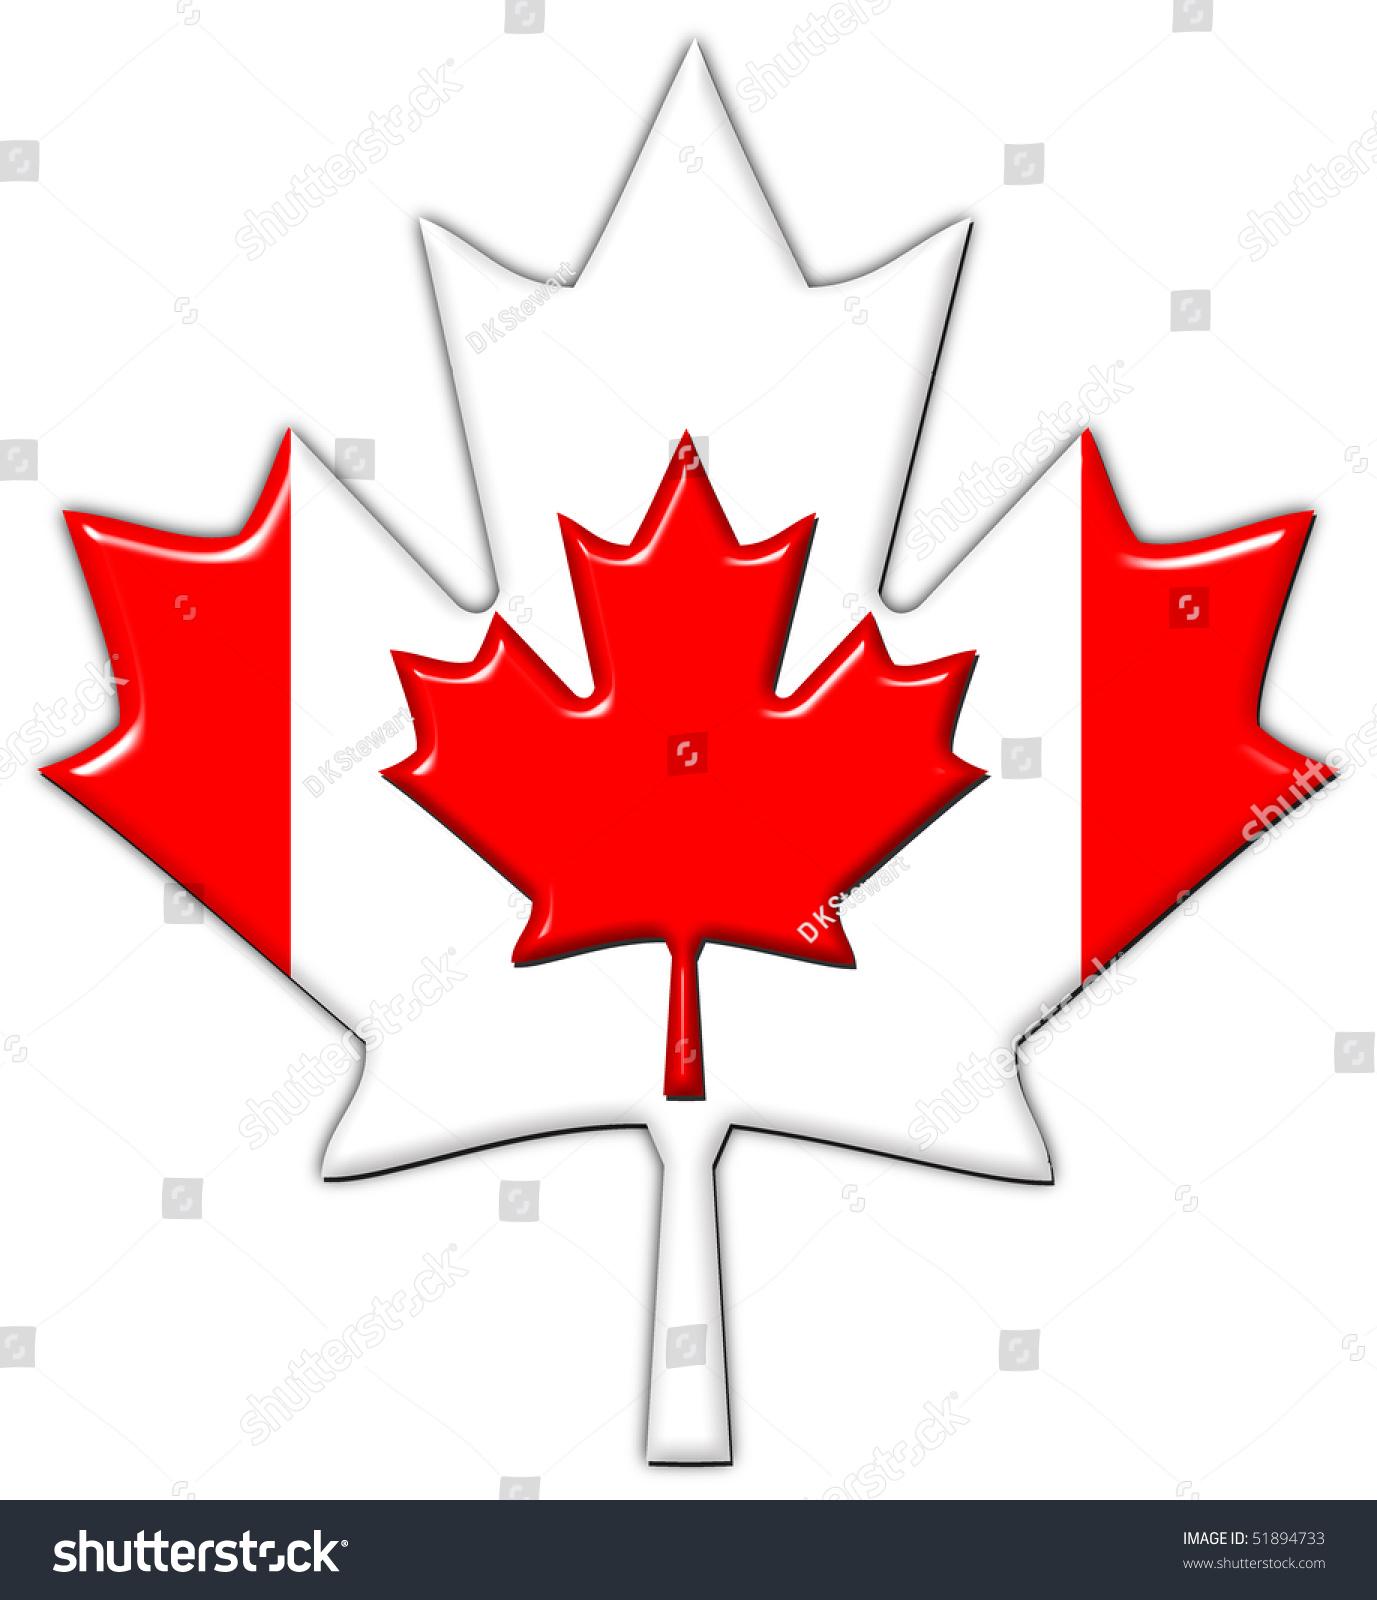 canada flag maple leaf stock illustration 51894733 shutterstock